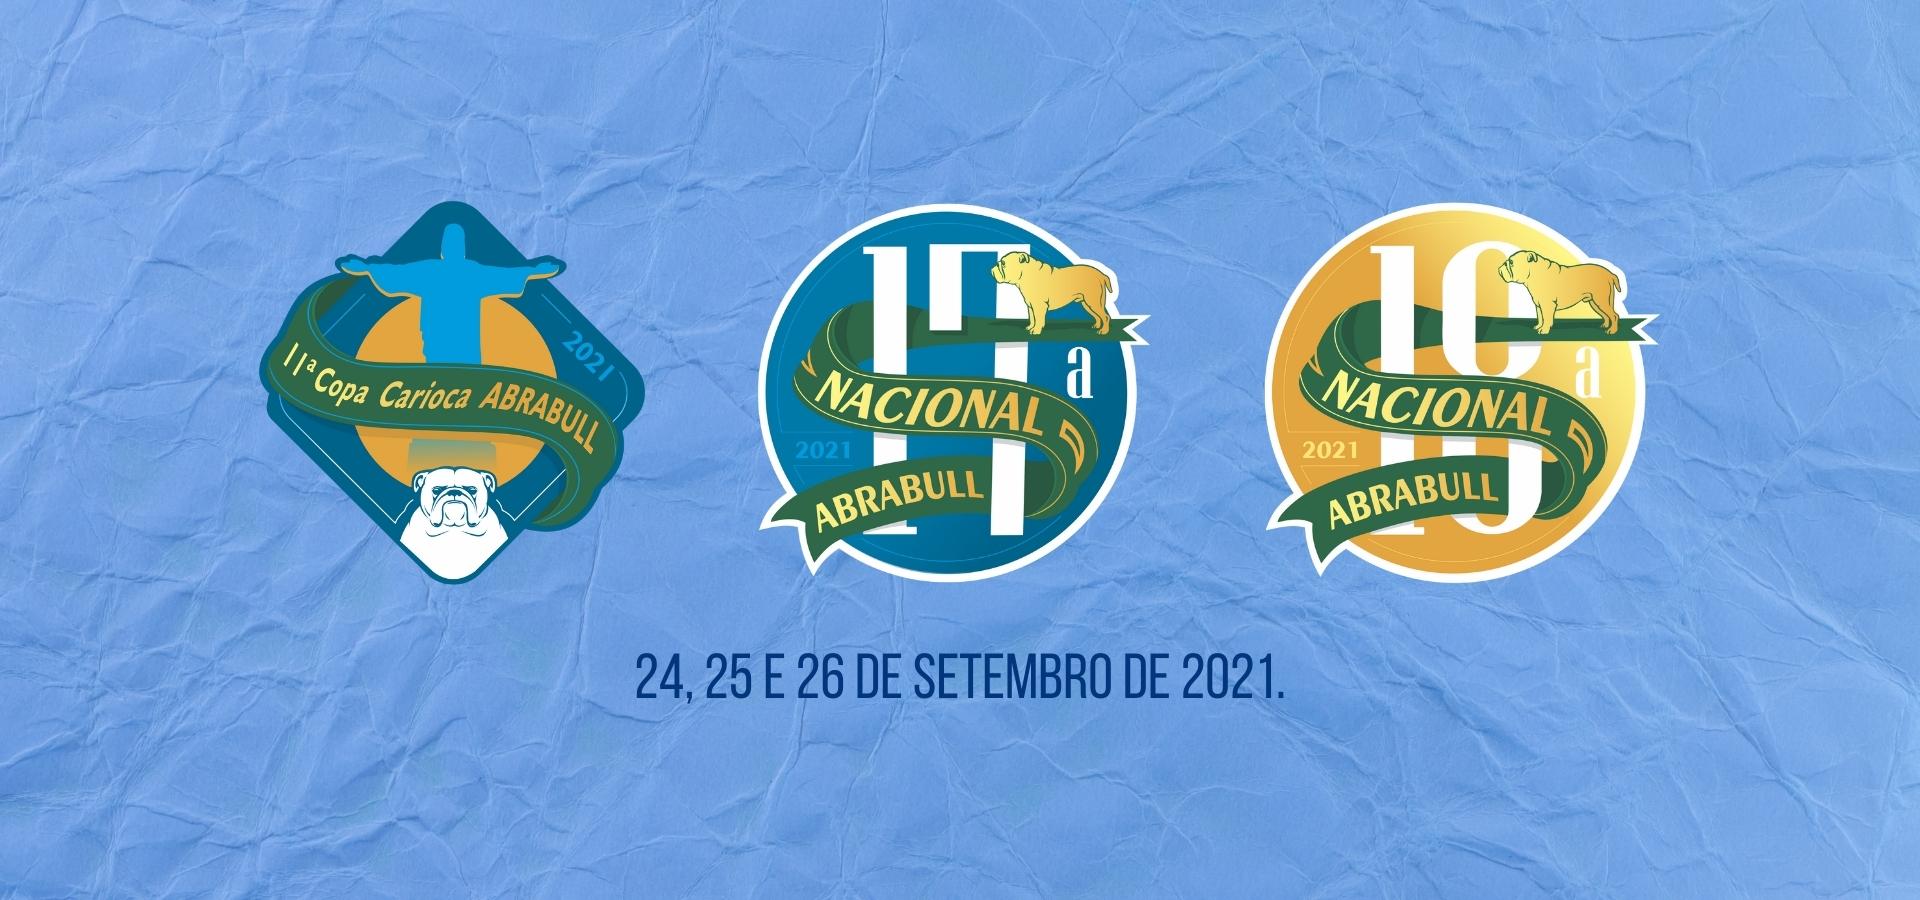 11ª Copa - 17ª Nacional e 18ª Nacional